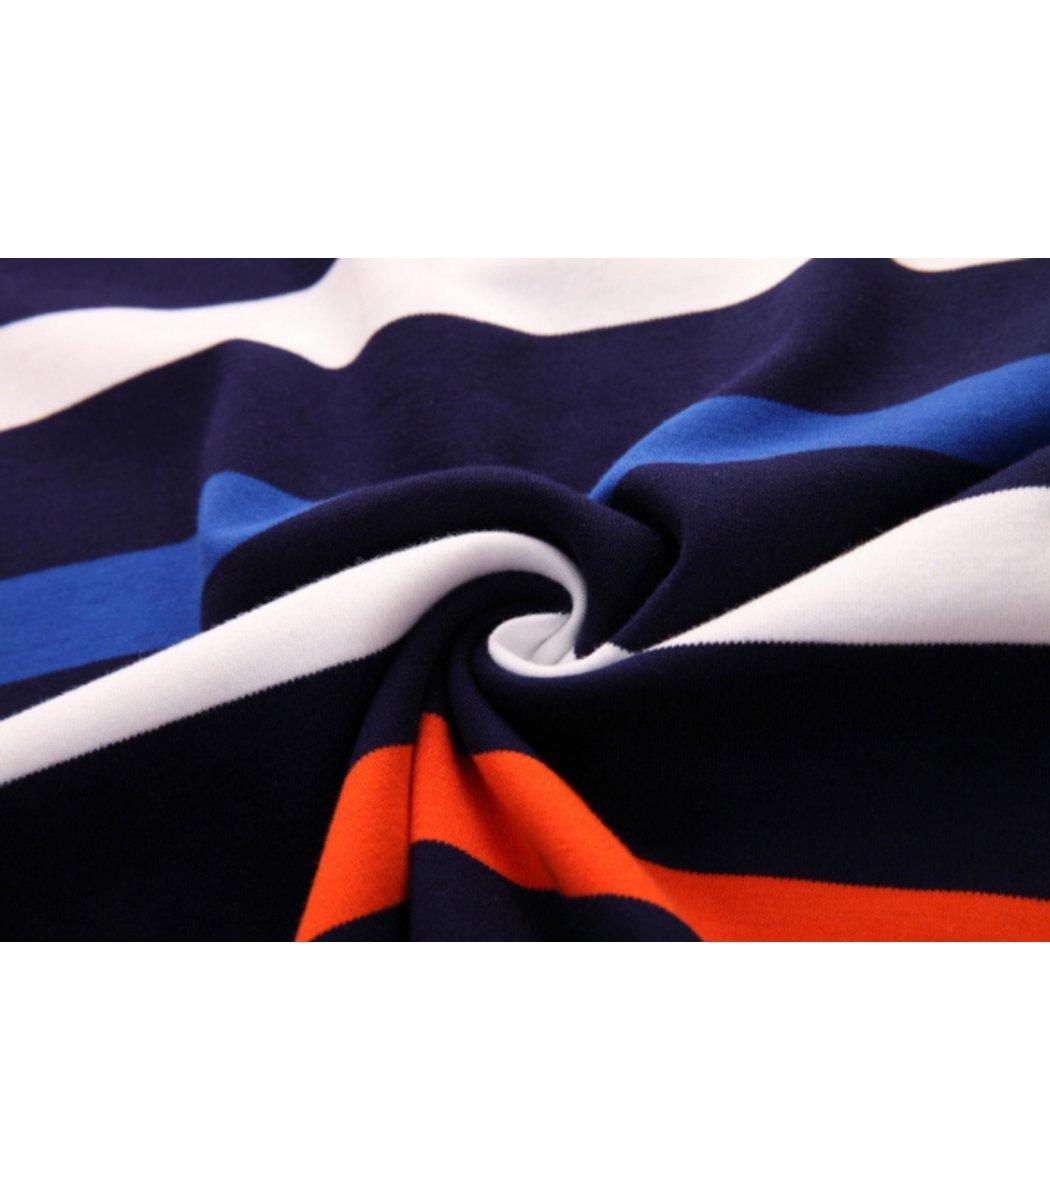 Поло с длинным рукавом Paul&Shark ST2 (Синий/Синий/Оранжевый)